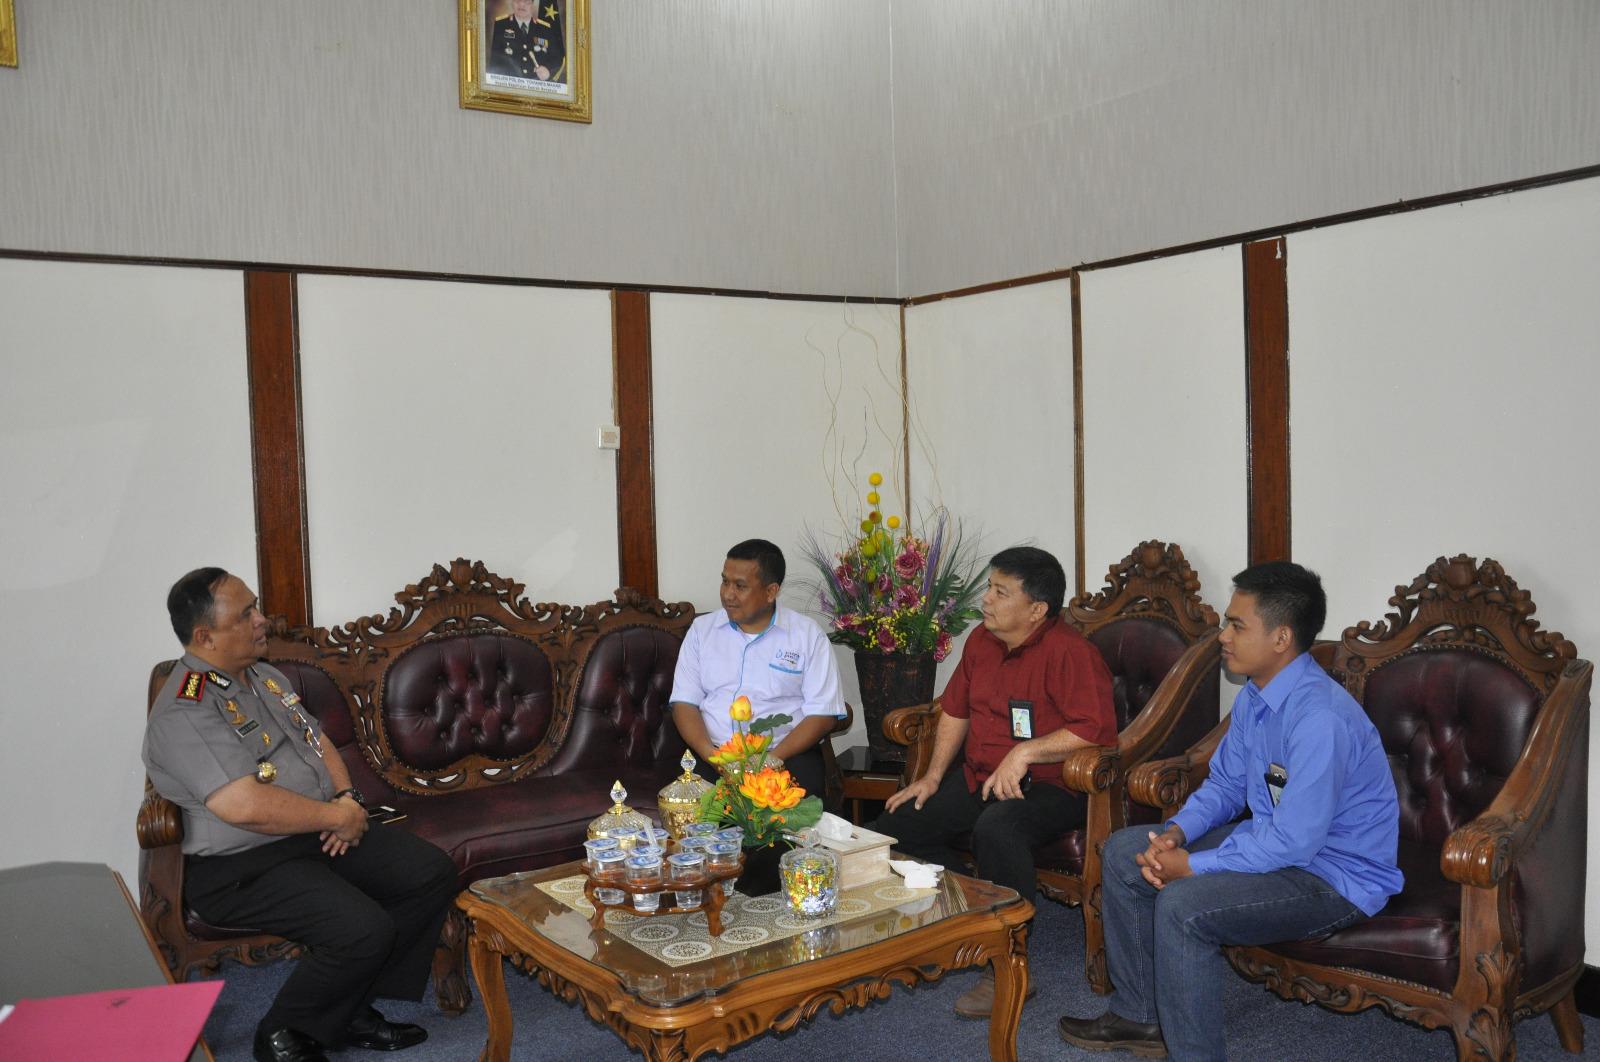 Wakapolda Bengkulu Terima Kunjungan Maneger PLN Area Bengkulu